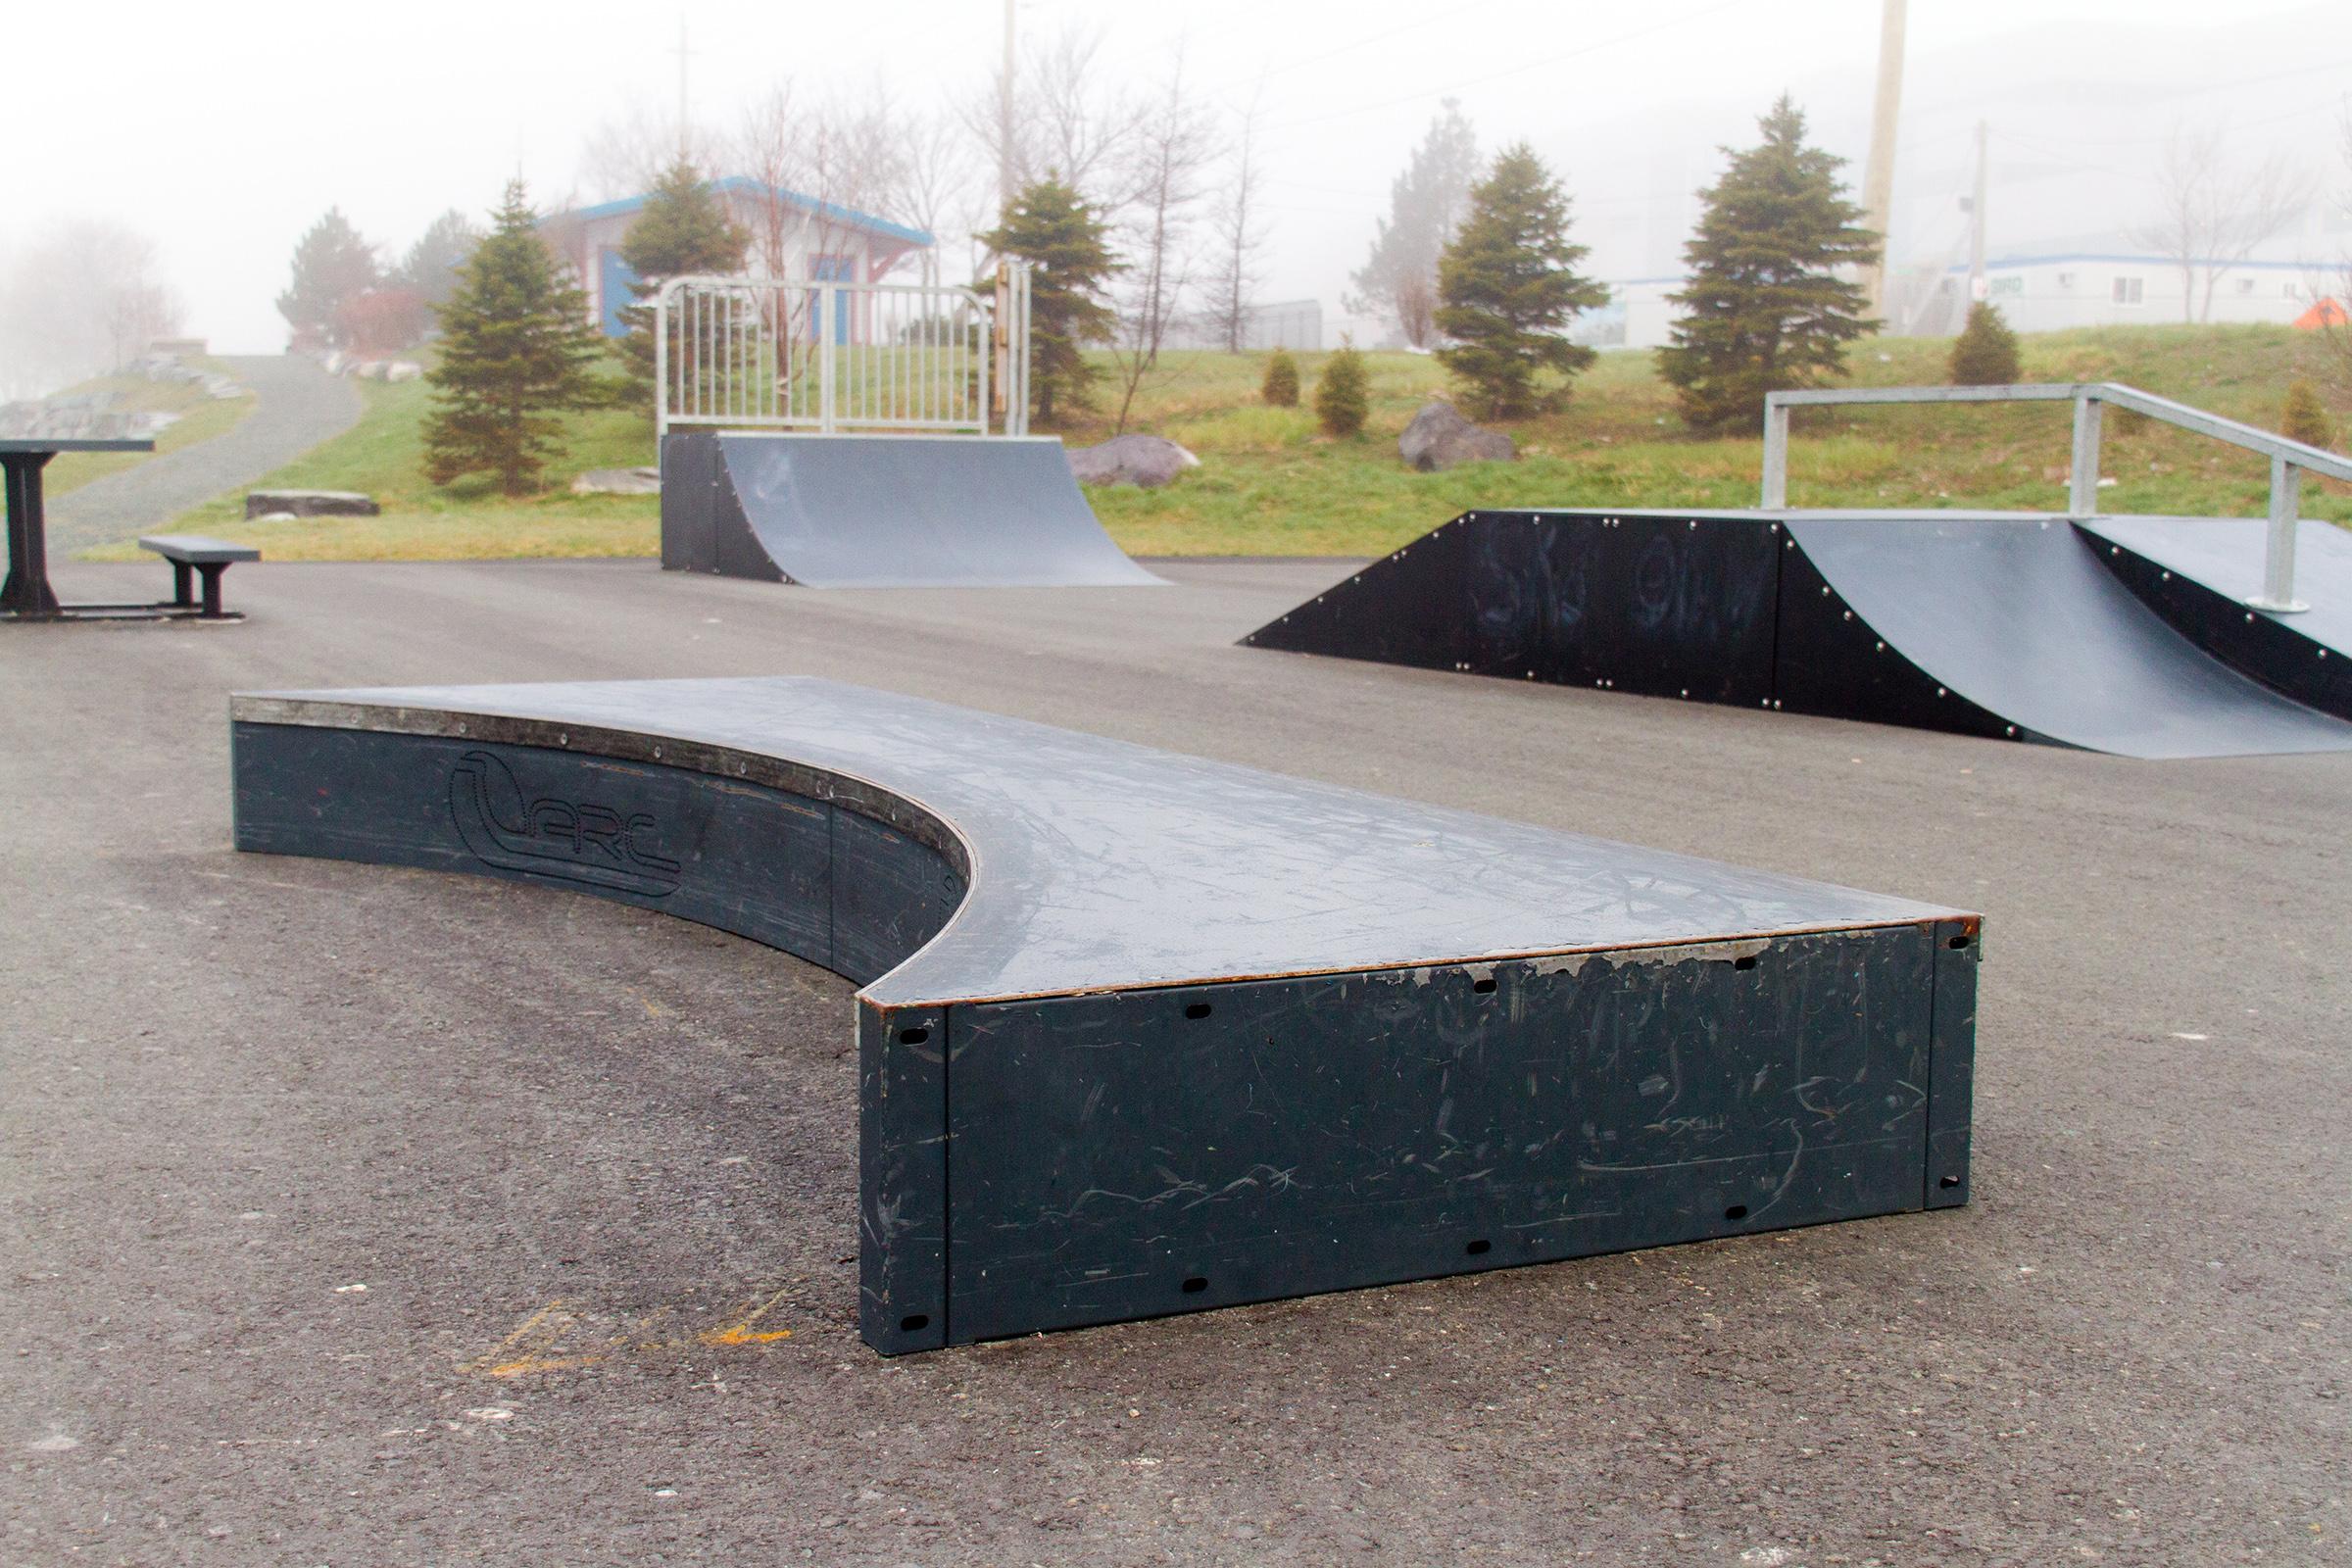 Skateboarding, Skateboard, Skate, Skater, Rollerblading, HQ Photo